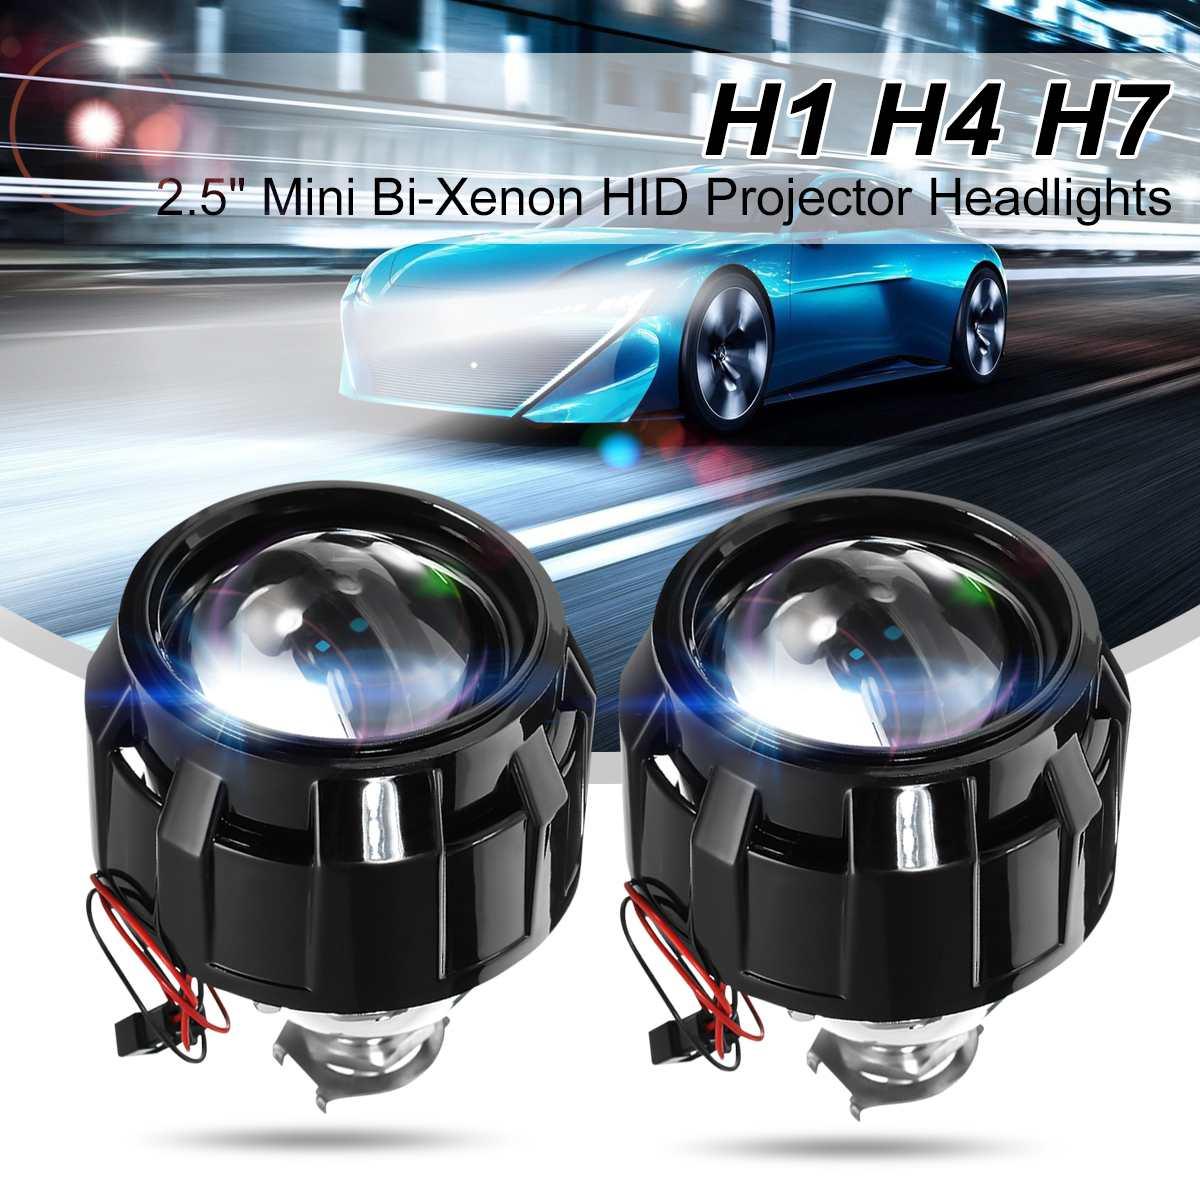 2 x Bi-Xenon HID Mini Retrofit Projectors Lens H1 H7 H4 Shroud For Audi 2016